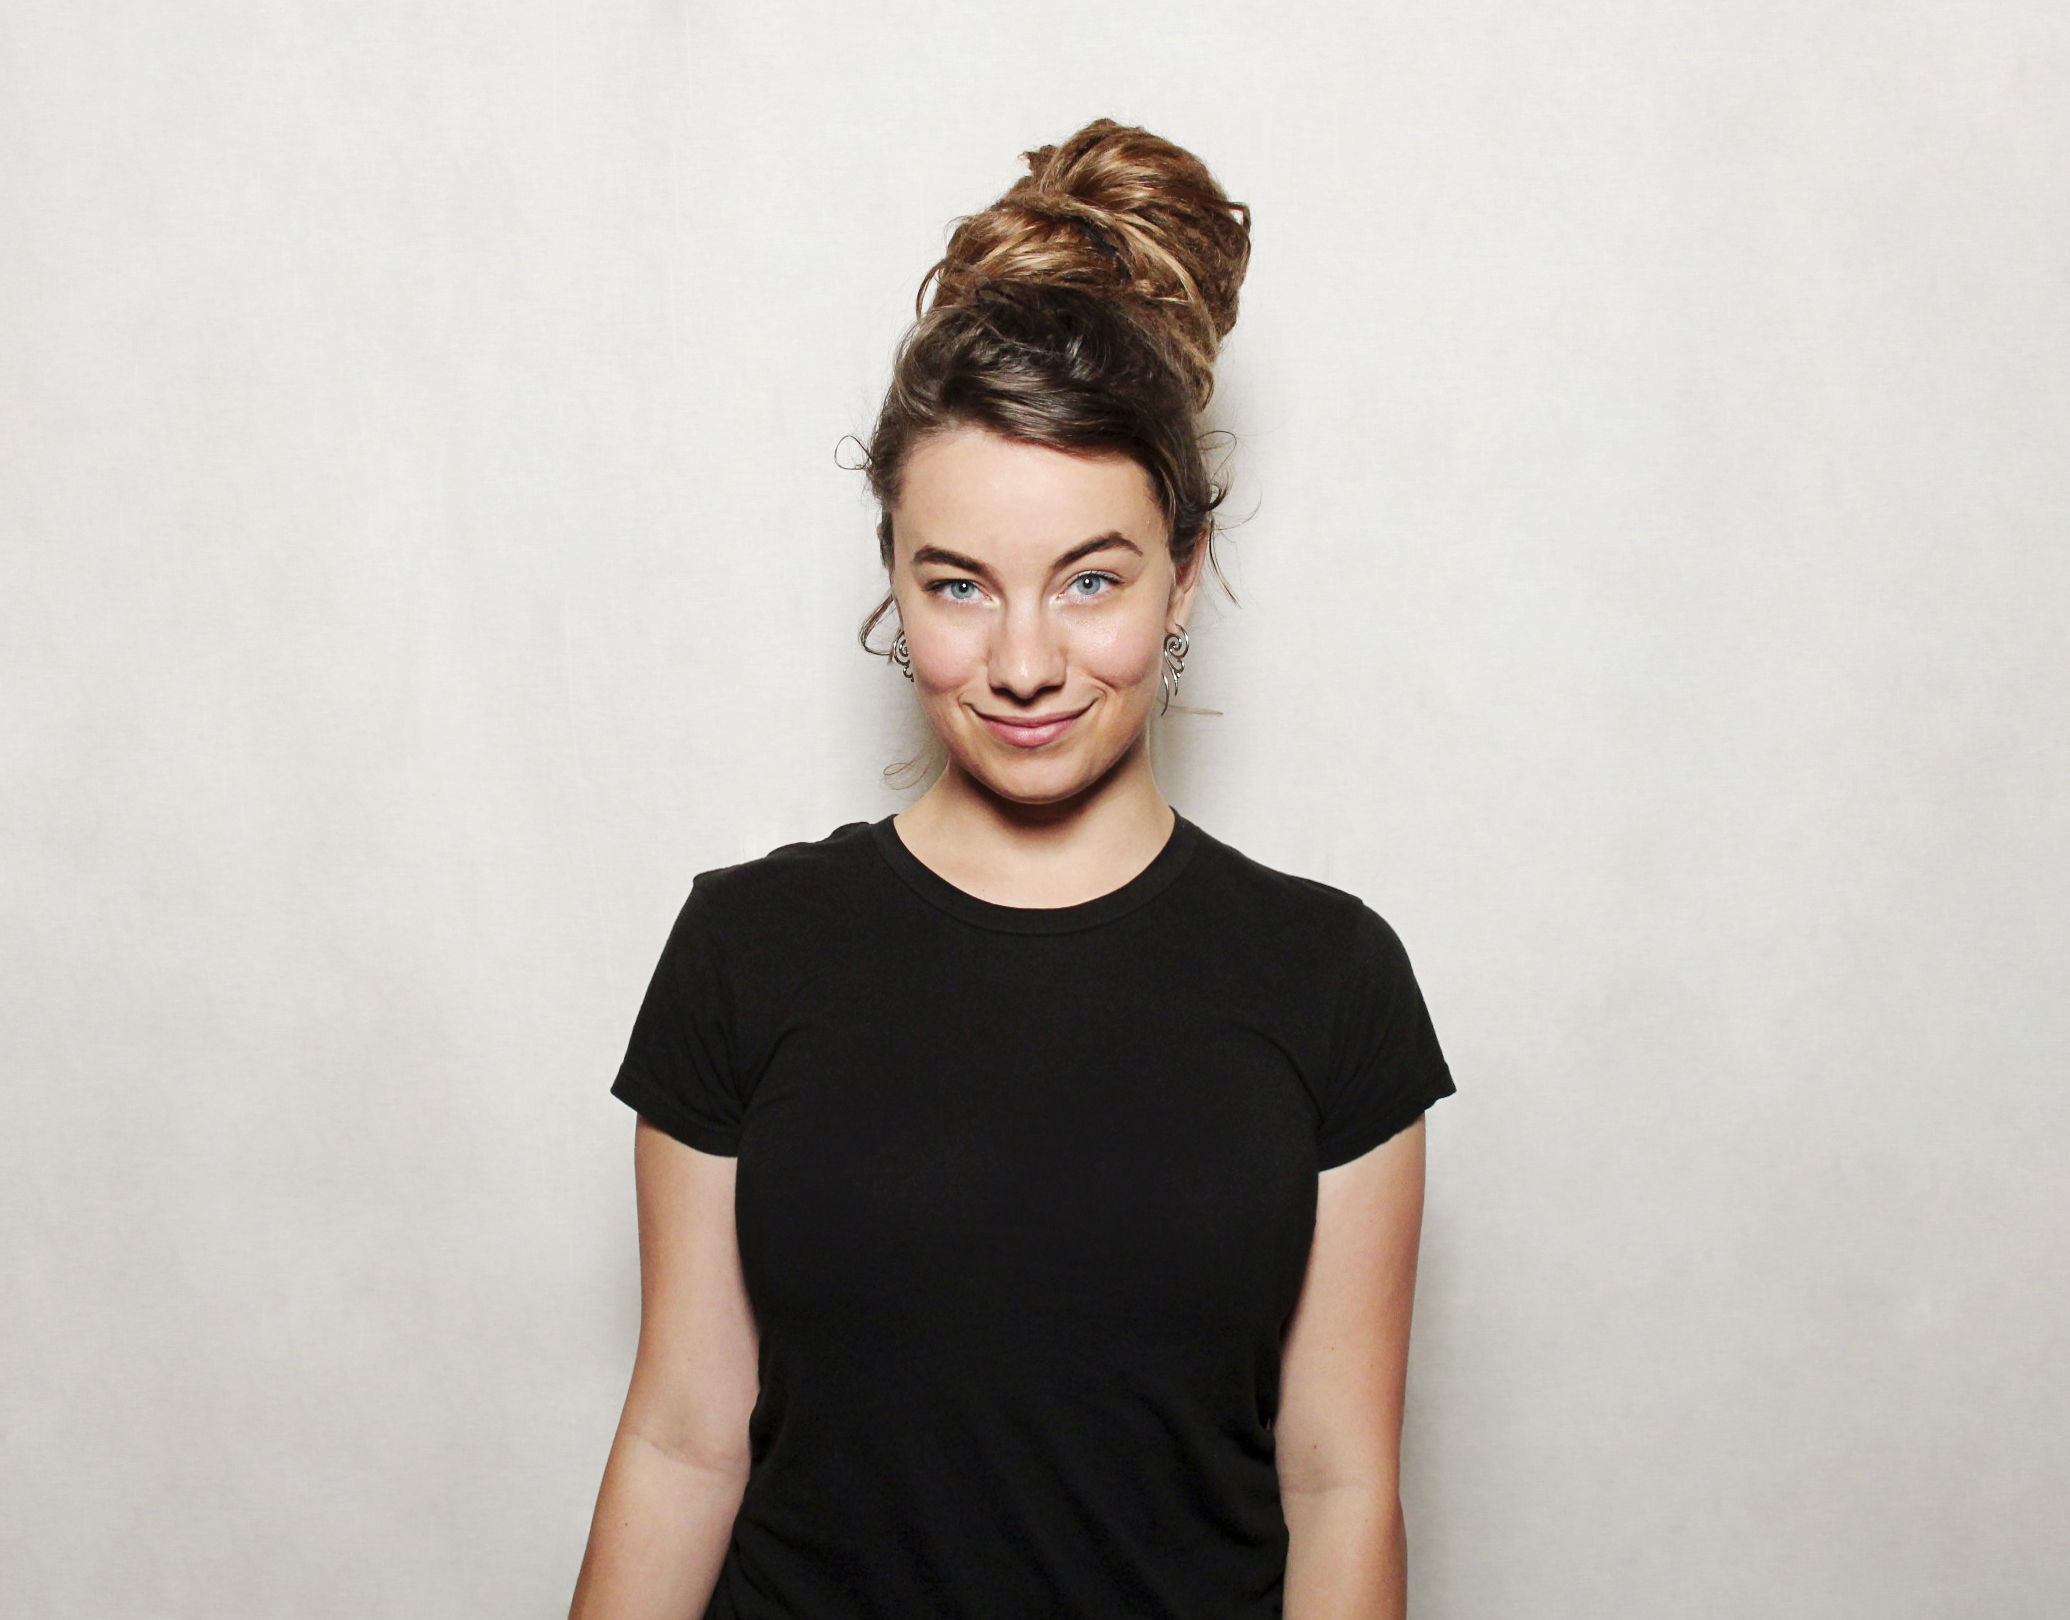 Hannah Barganier